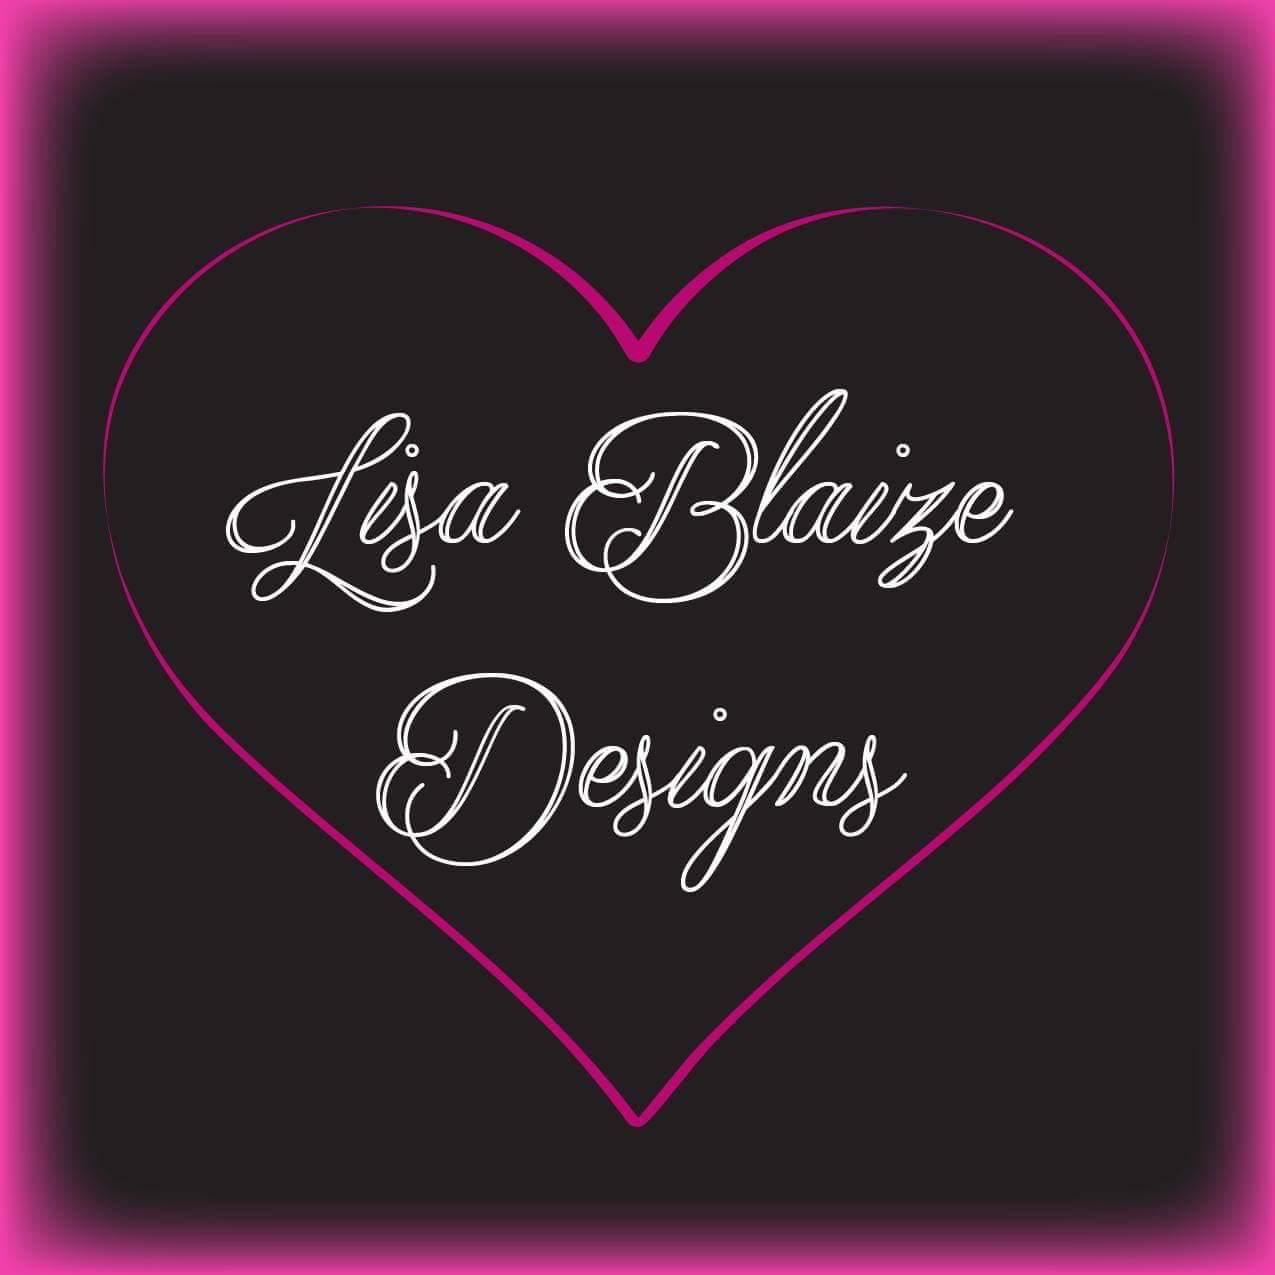 Lisa Blaize Designs